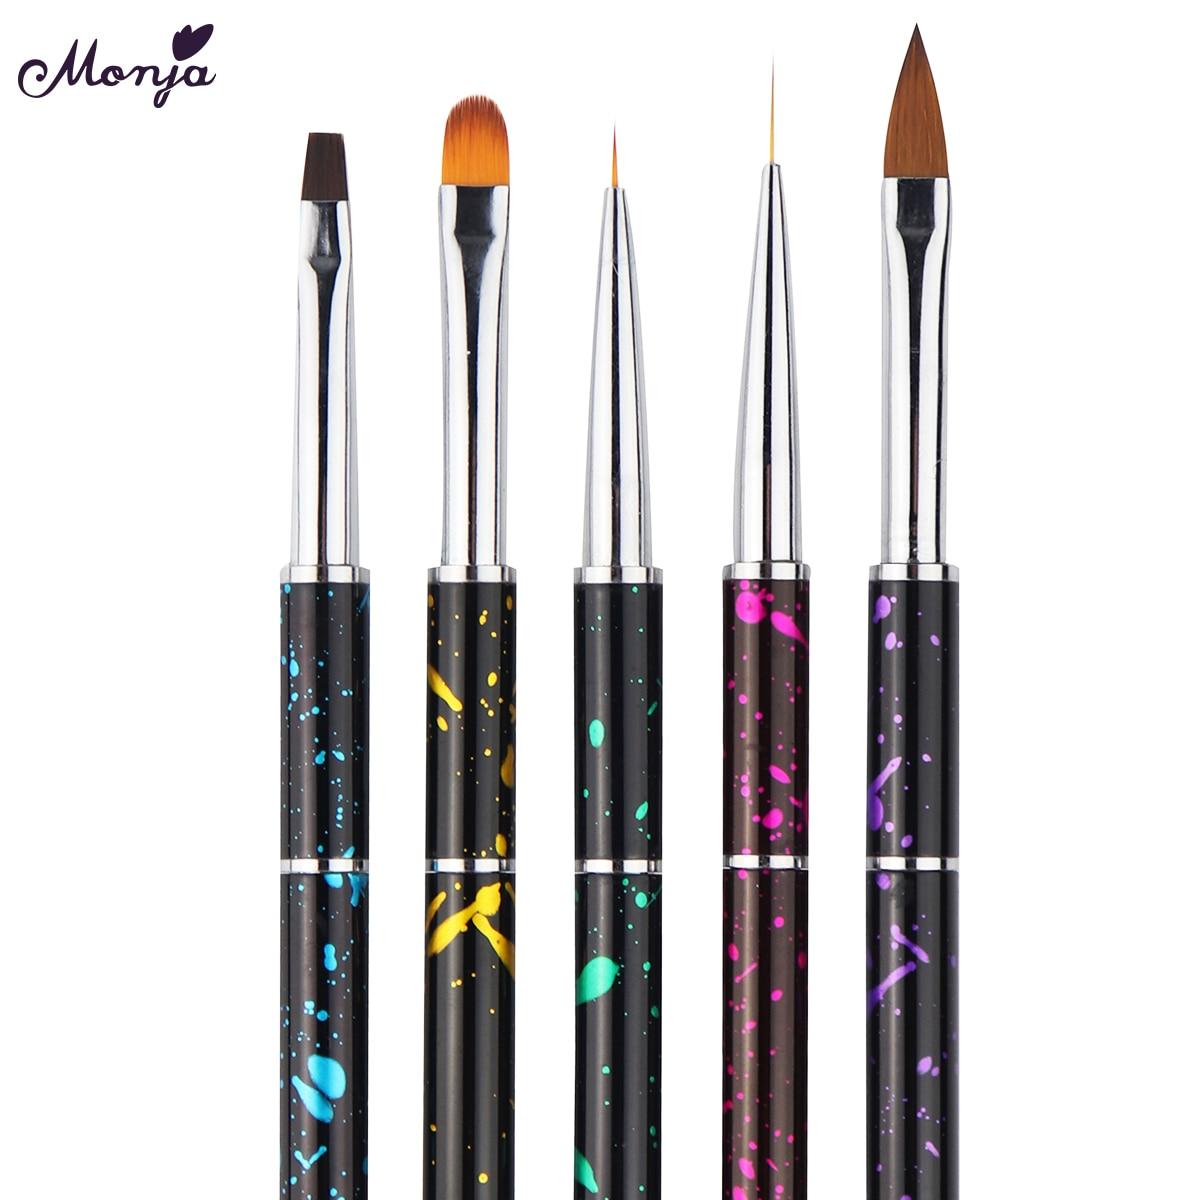 Monja Nail Art Detachable French Stripe Lines Painting Liner Acrylic UV Gel Extension Builder Liquid Powder Carving Brush Pen